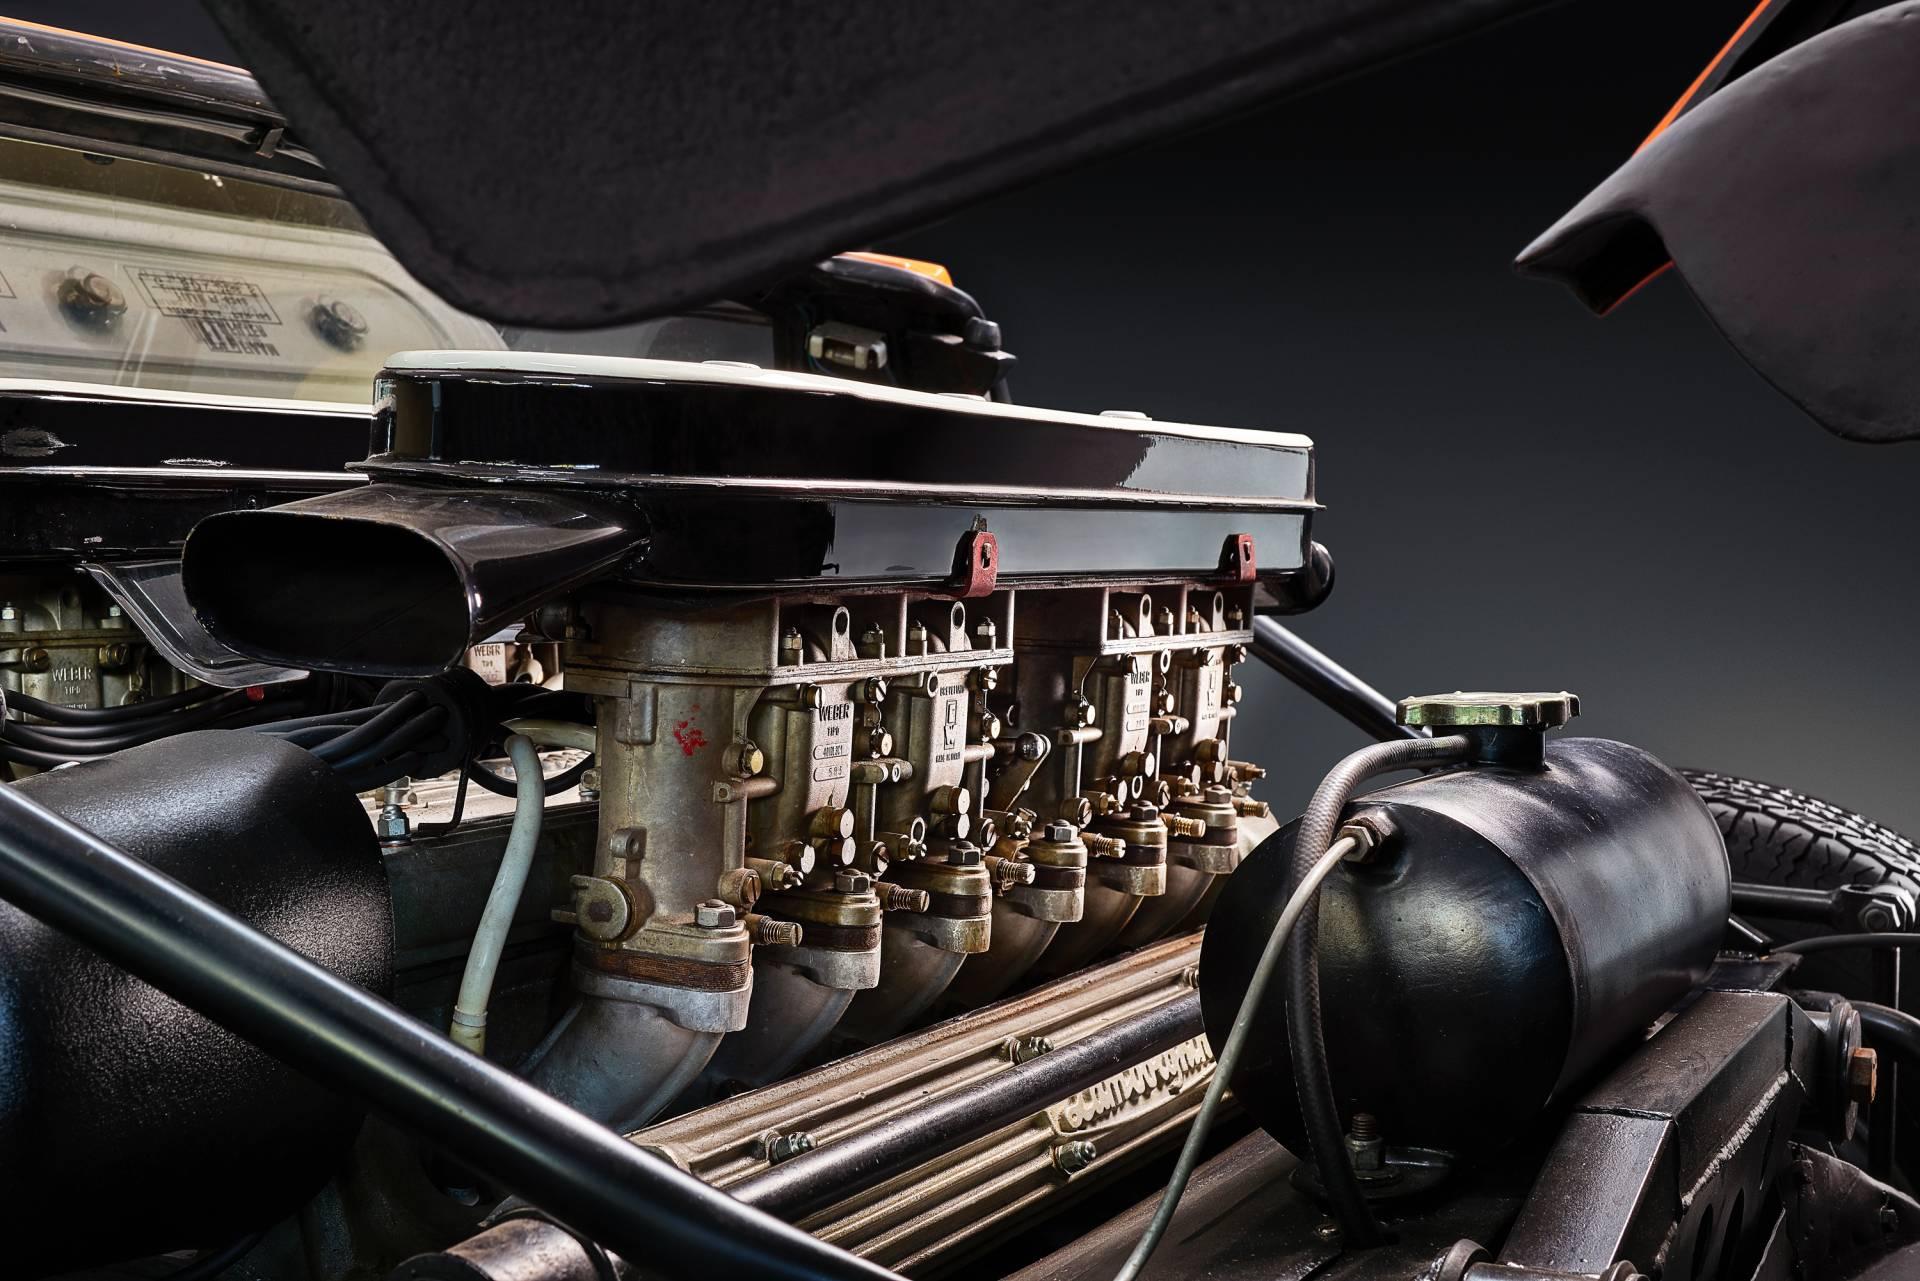 لامبورجيني ميورا P400